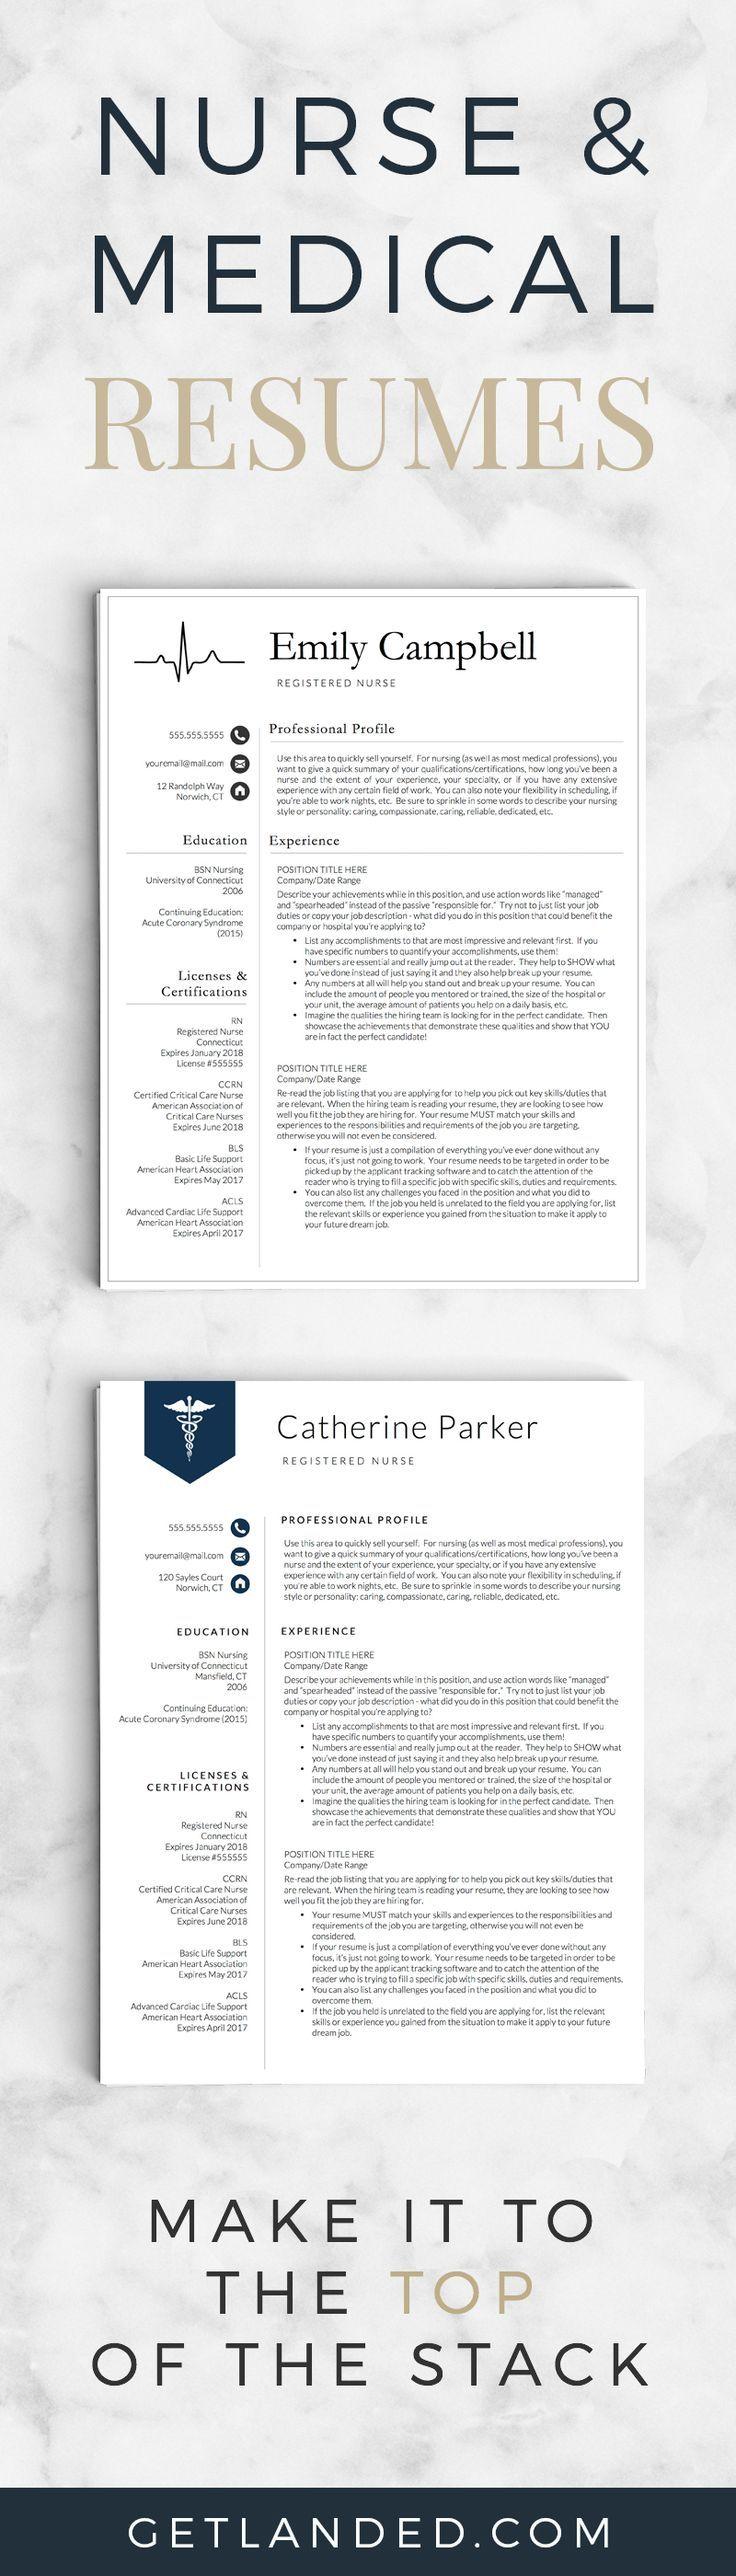 Nurse resume templates | Medical resumes | Resume templates ...